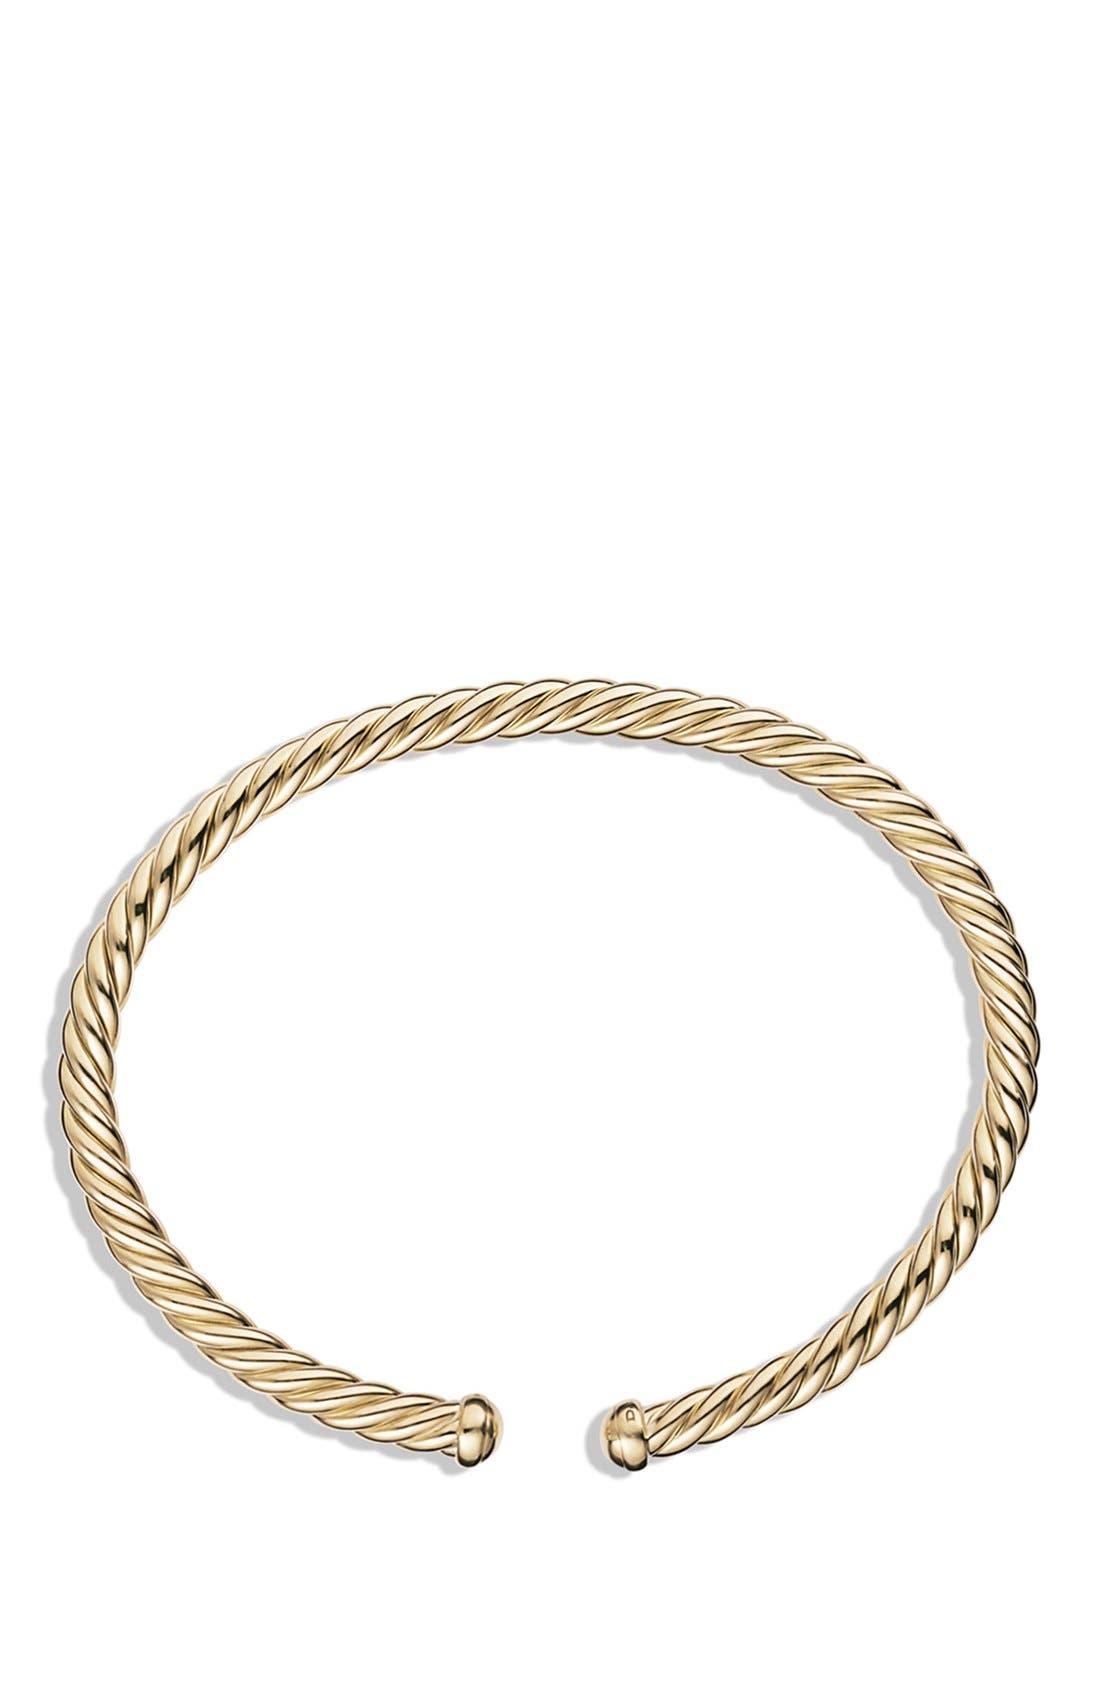 Cable Spira Bracelet in 18K Gold, 4mm,                             Alternate thumbnail 3, color,                             GOLD